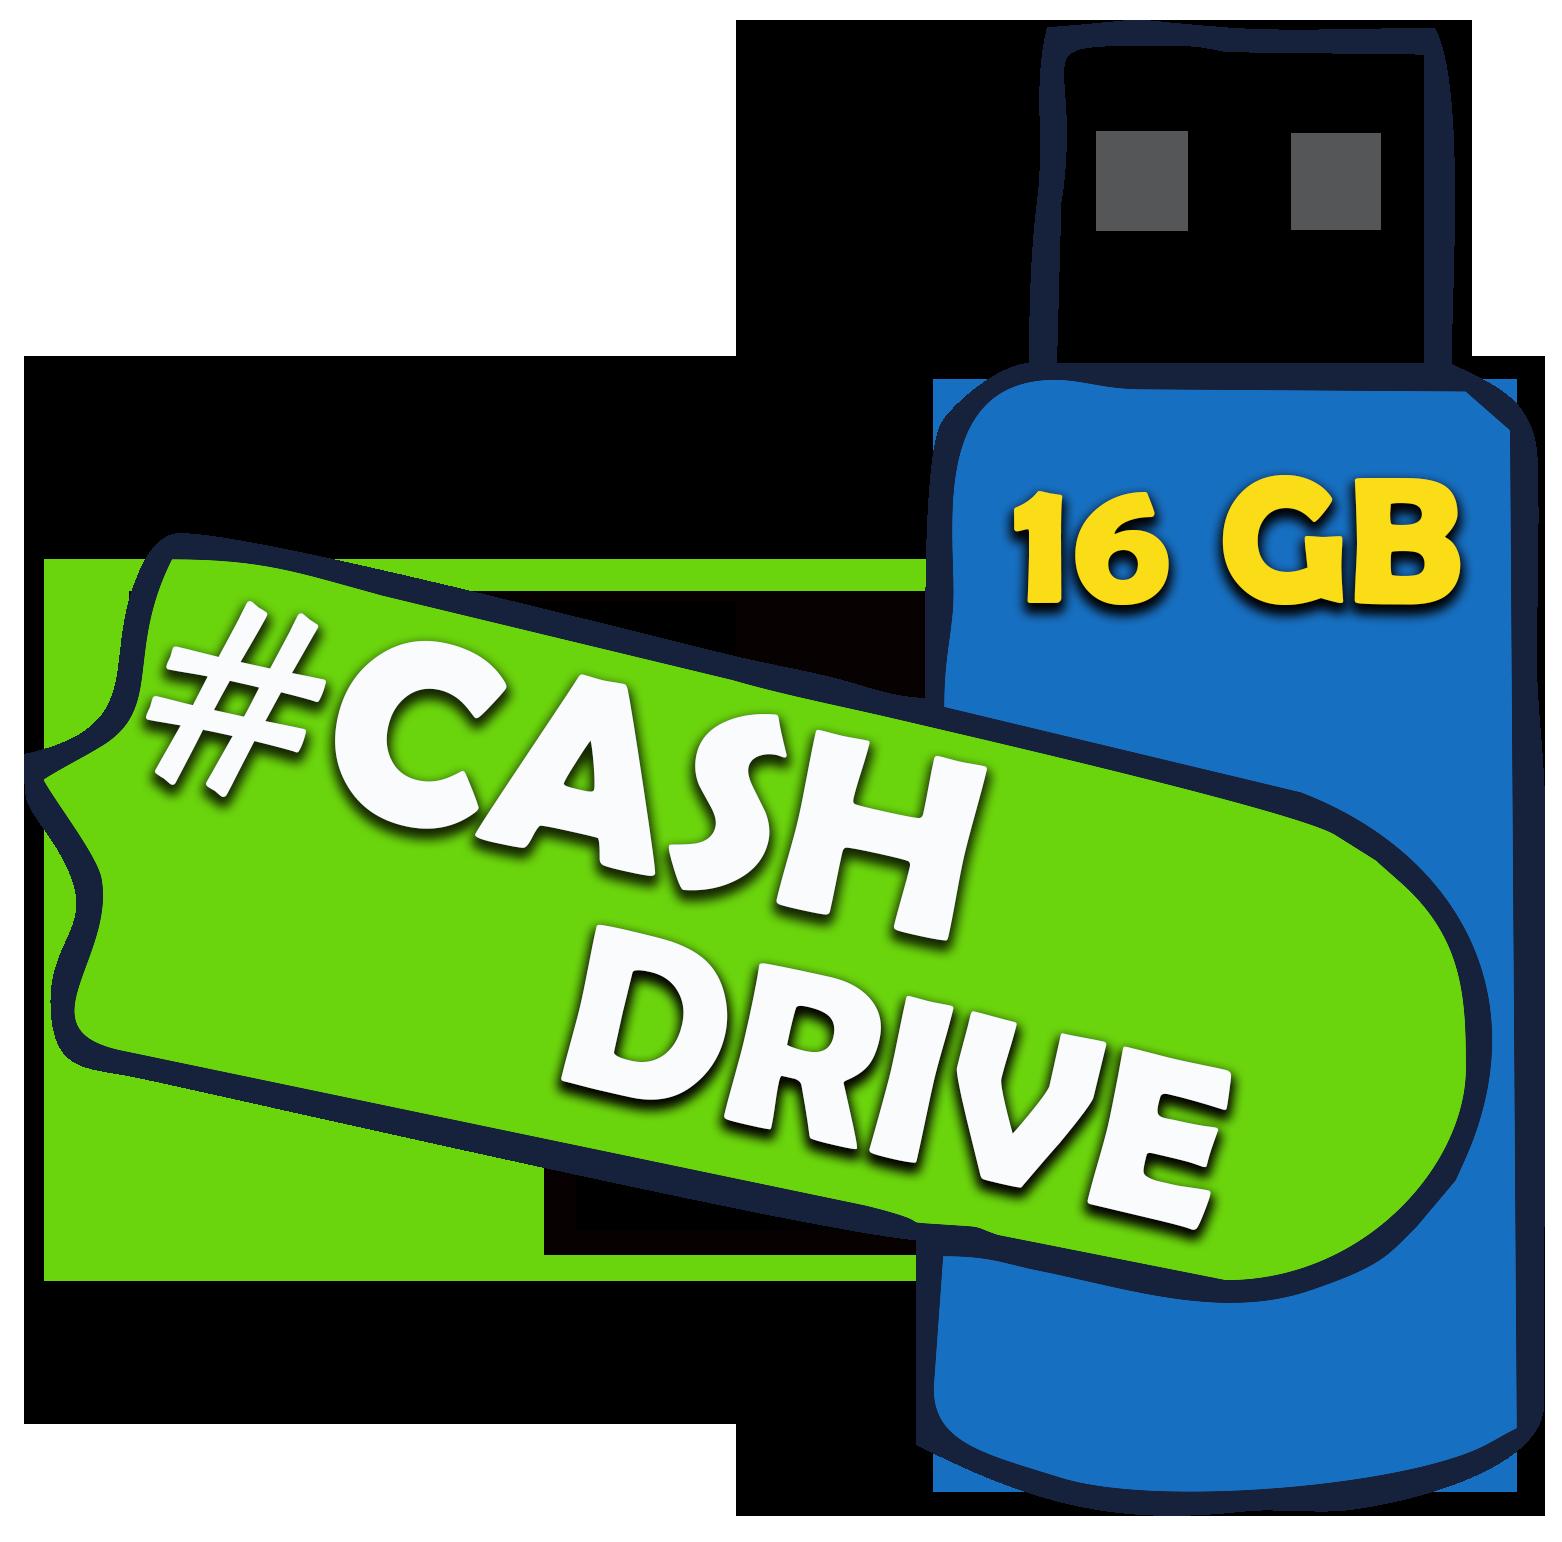 Voucher #Cashdrivecombo16gb - Para Empresas e Fotógrafos 16 GB